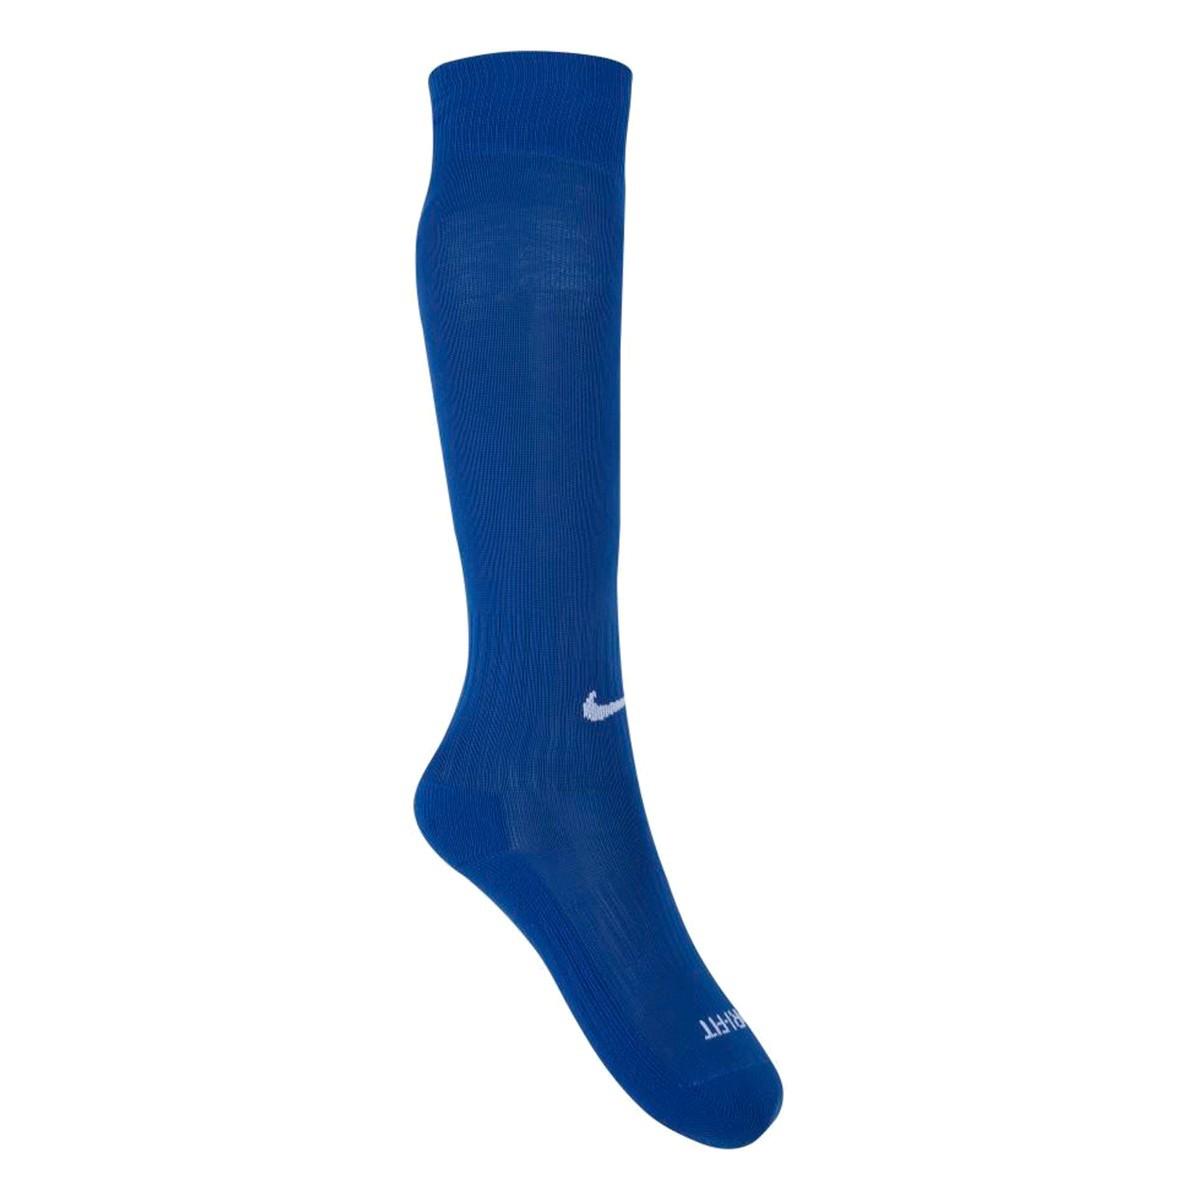 Meião Nike Classic Football Dri-Fit Azul